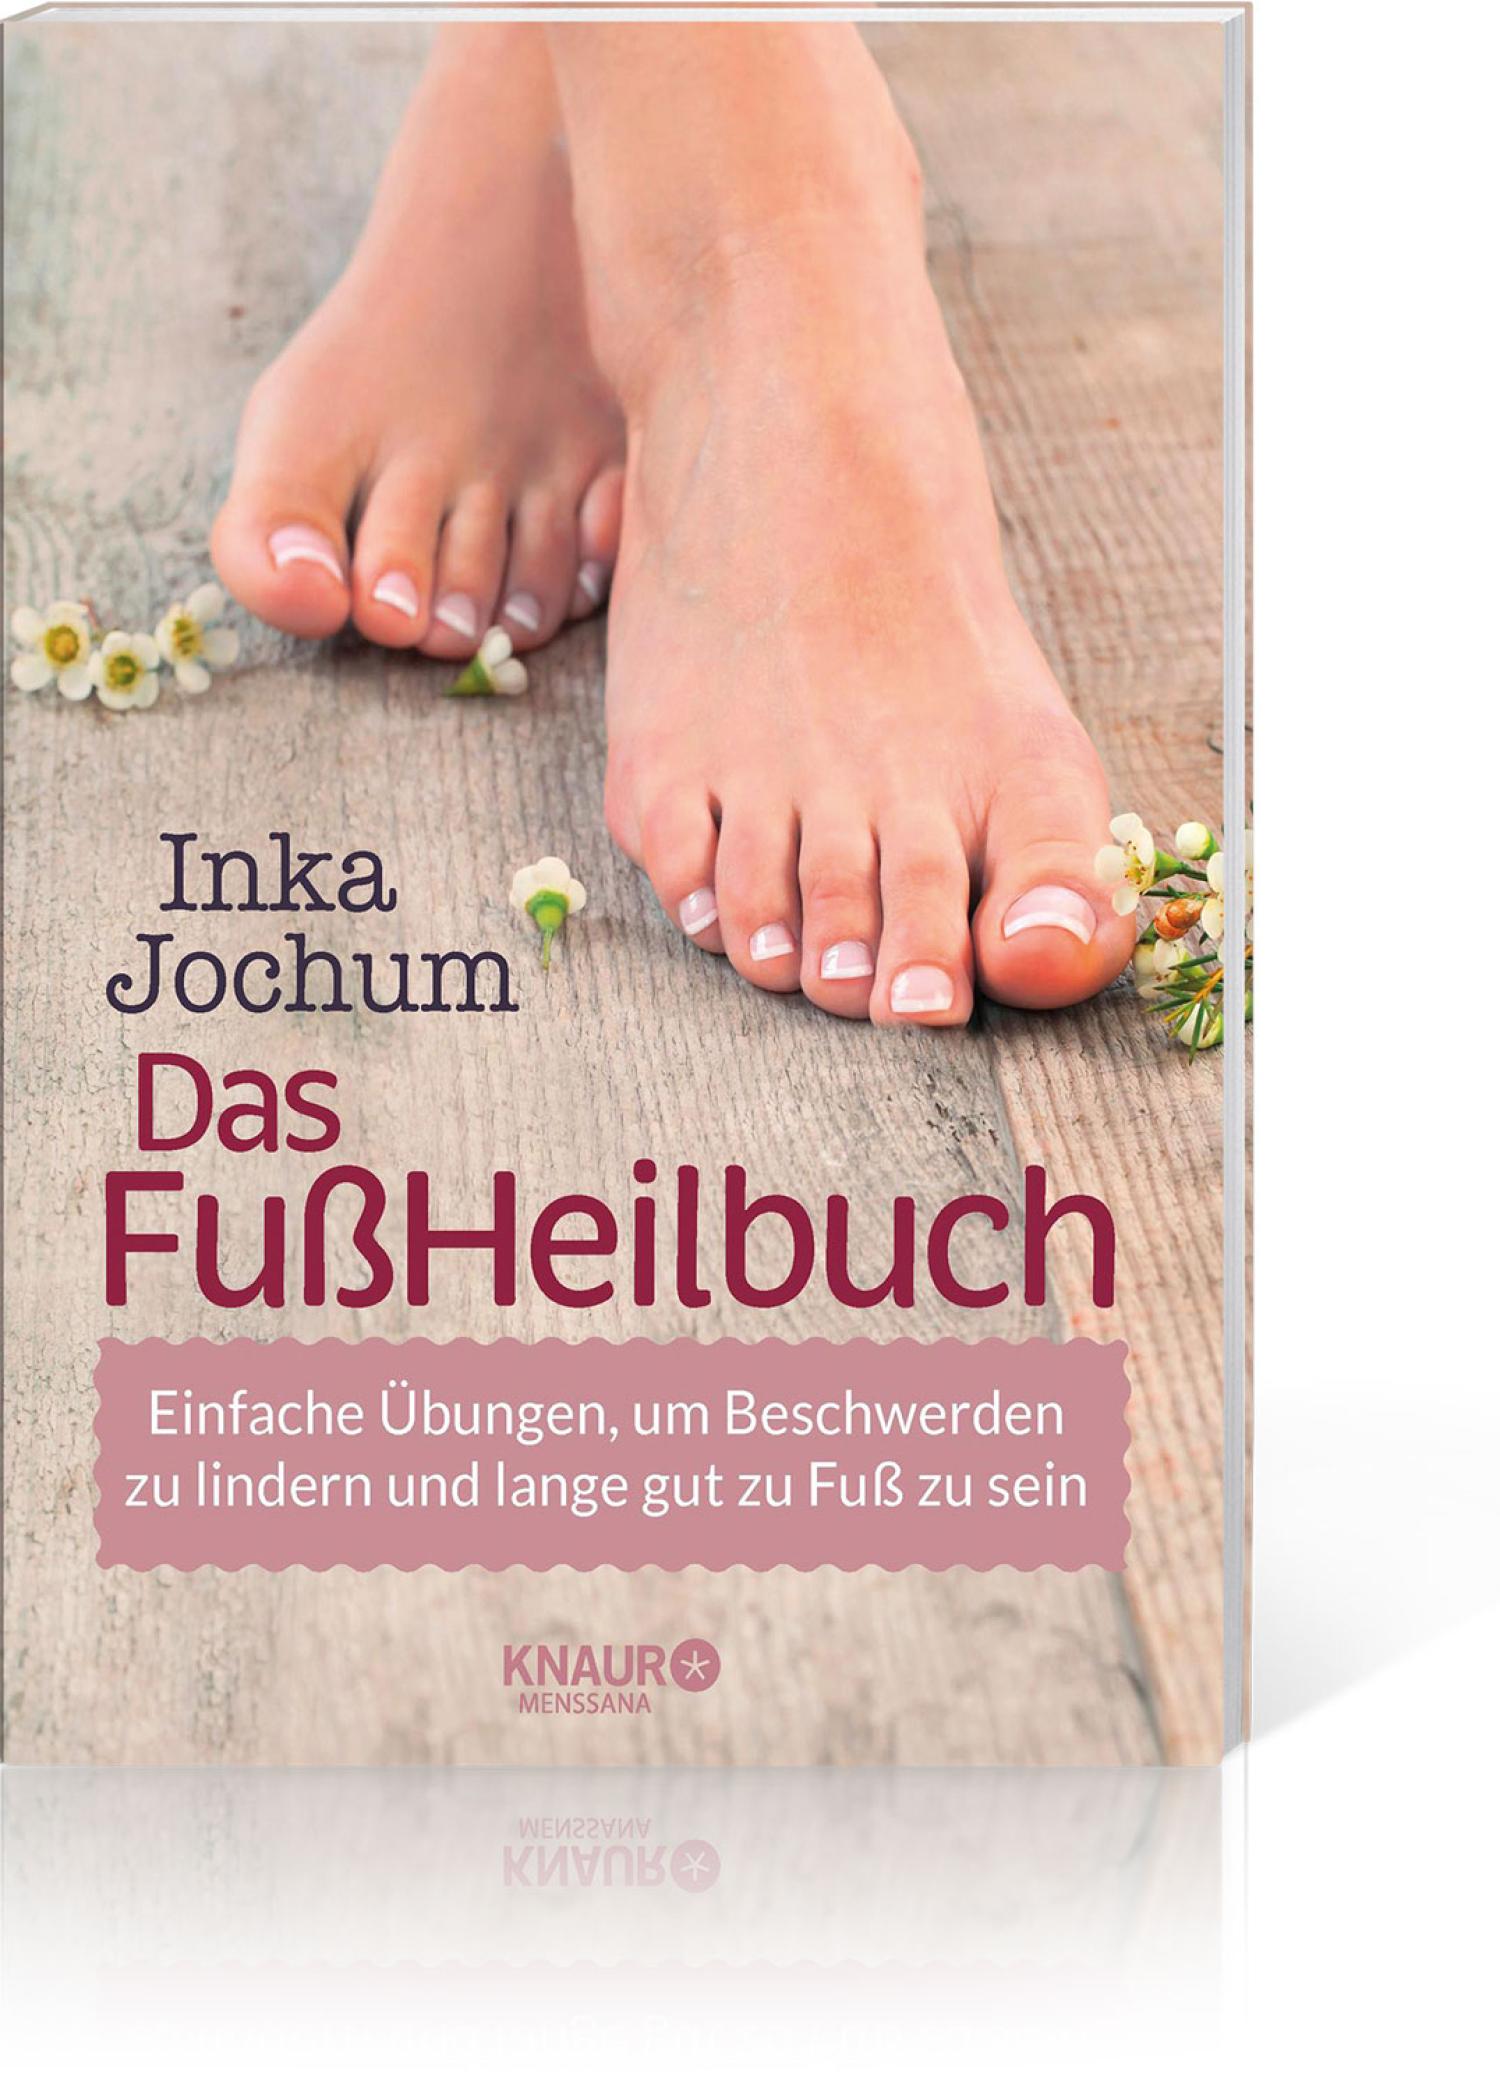 Das FußHeilbuch, Produktbild 1